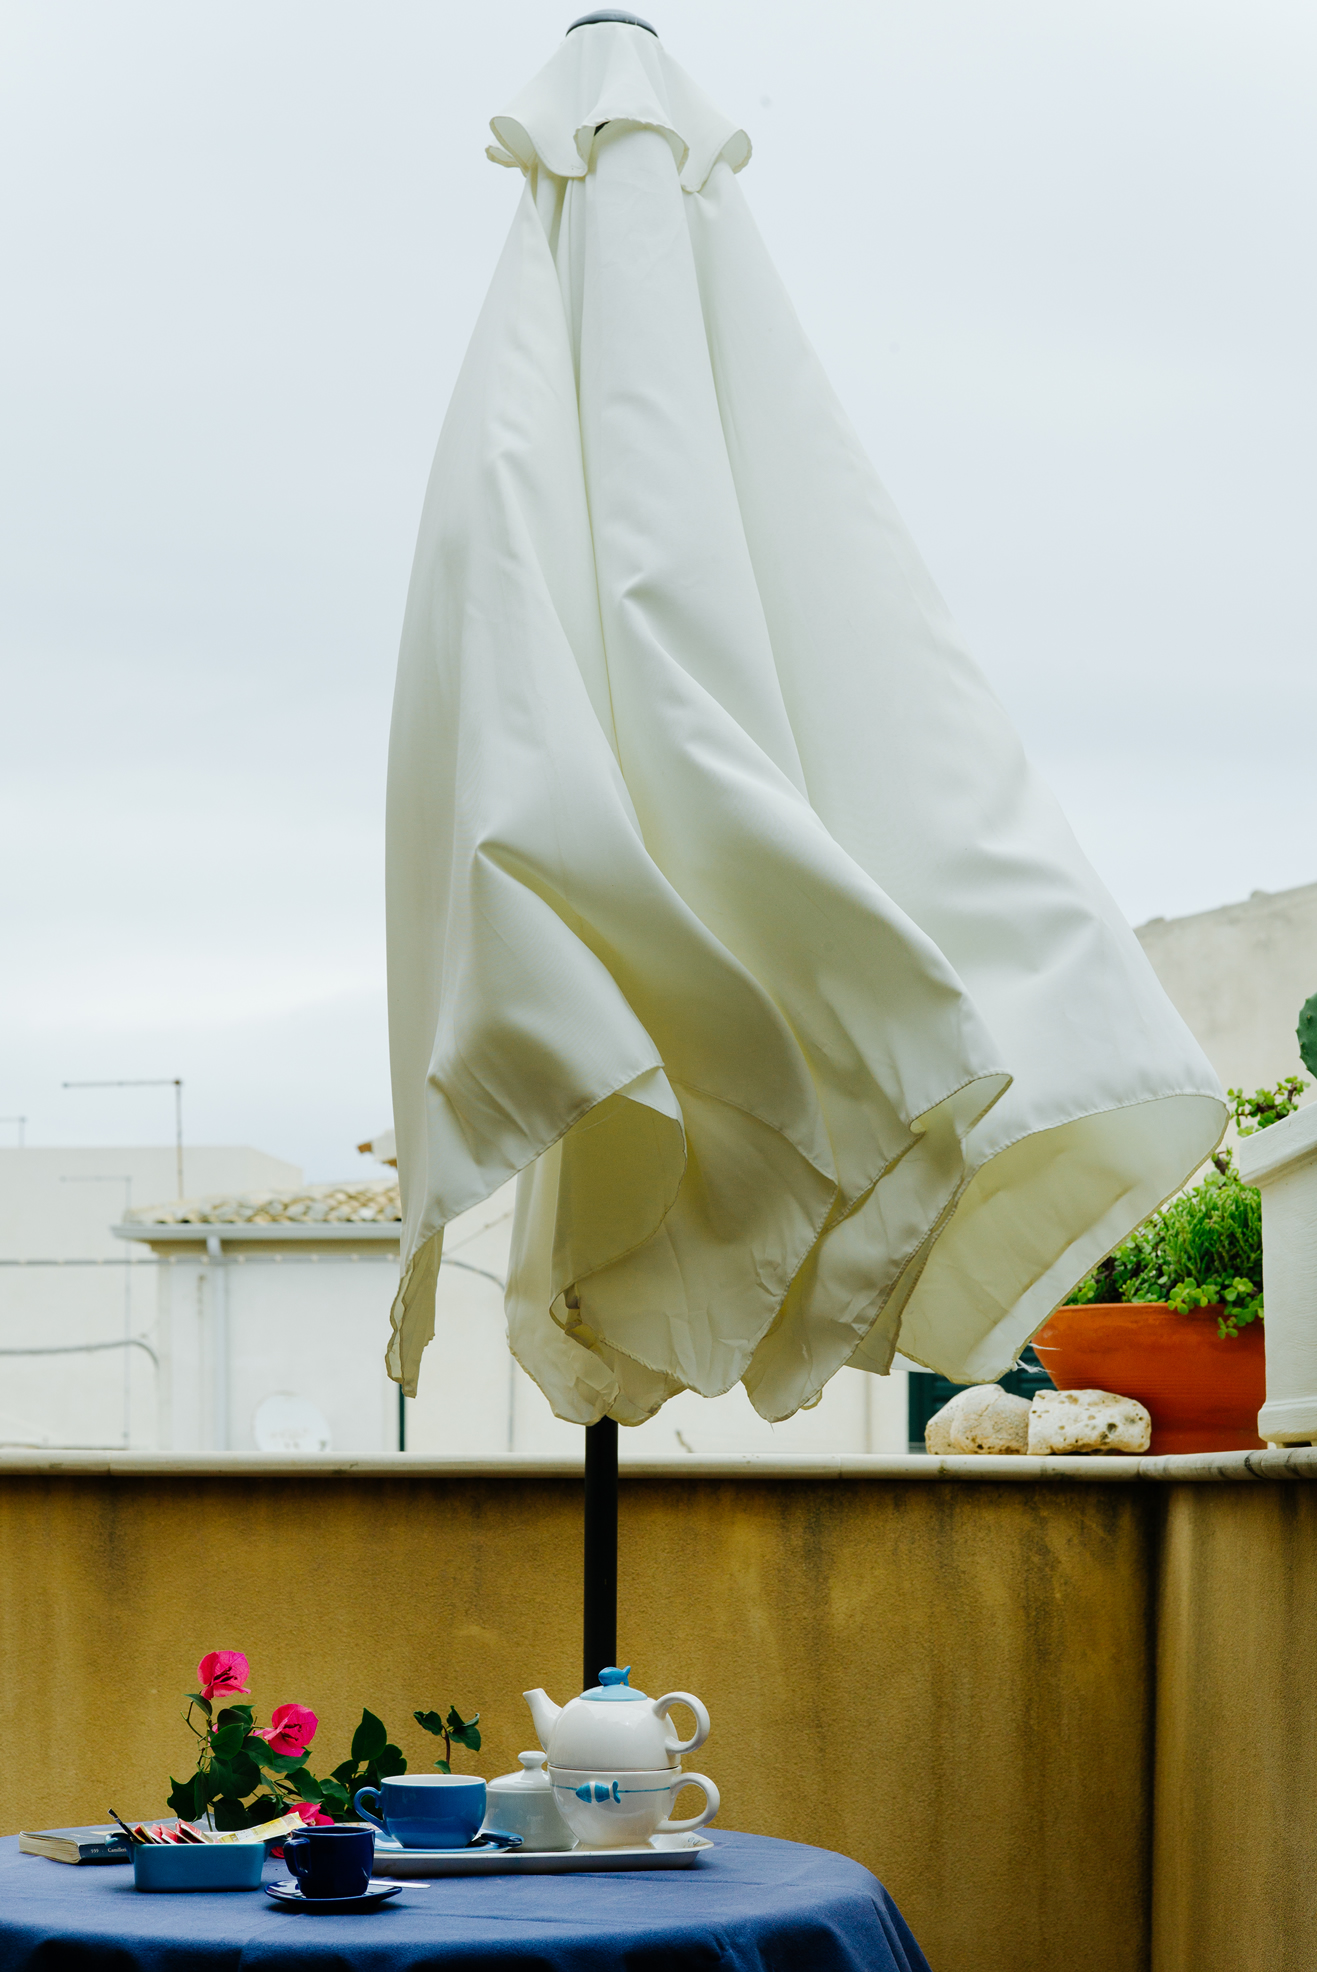 21sampieri-casa-vacanze-sicilia-appartamento-sicily-holiday-apartment-casa-di-pietra-italia-italy.jpg